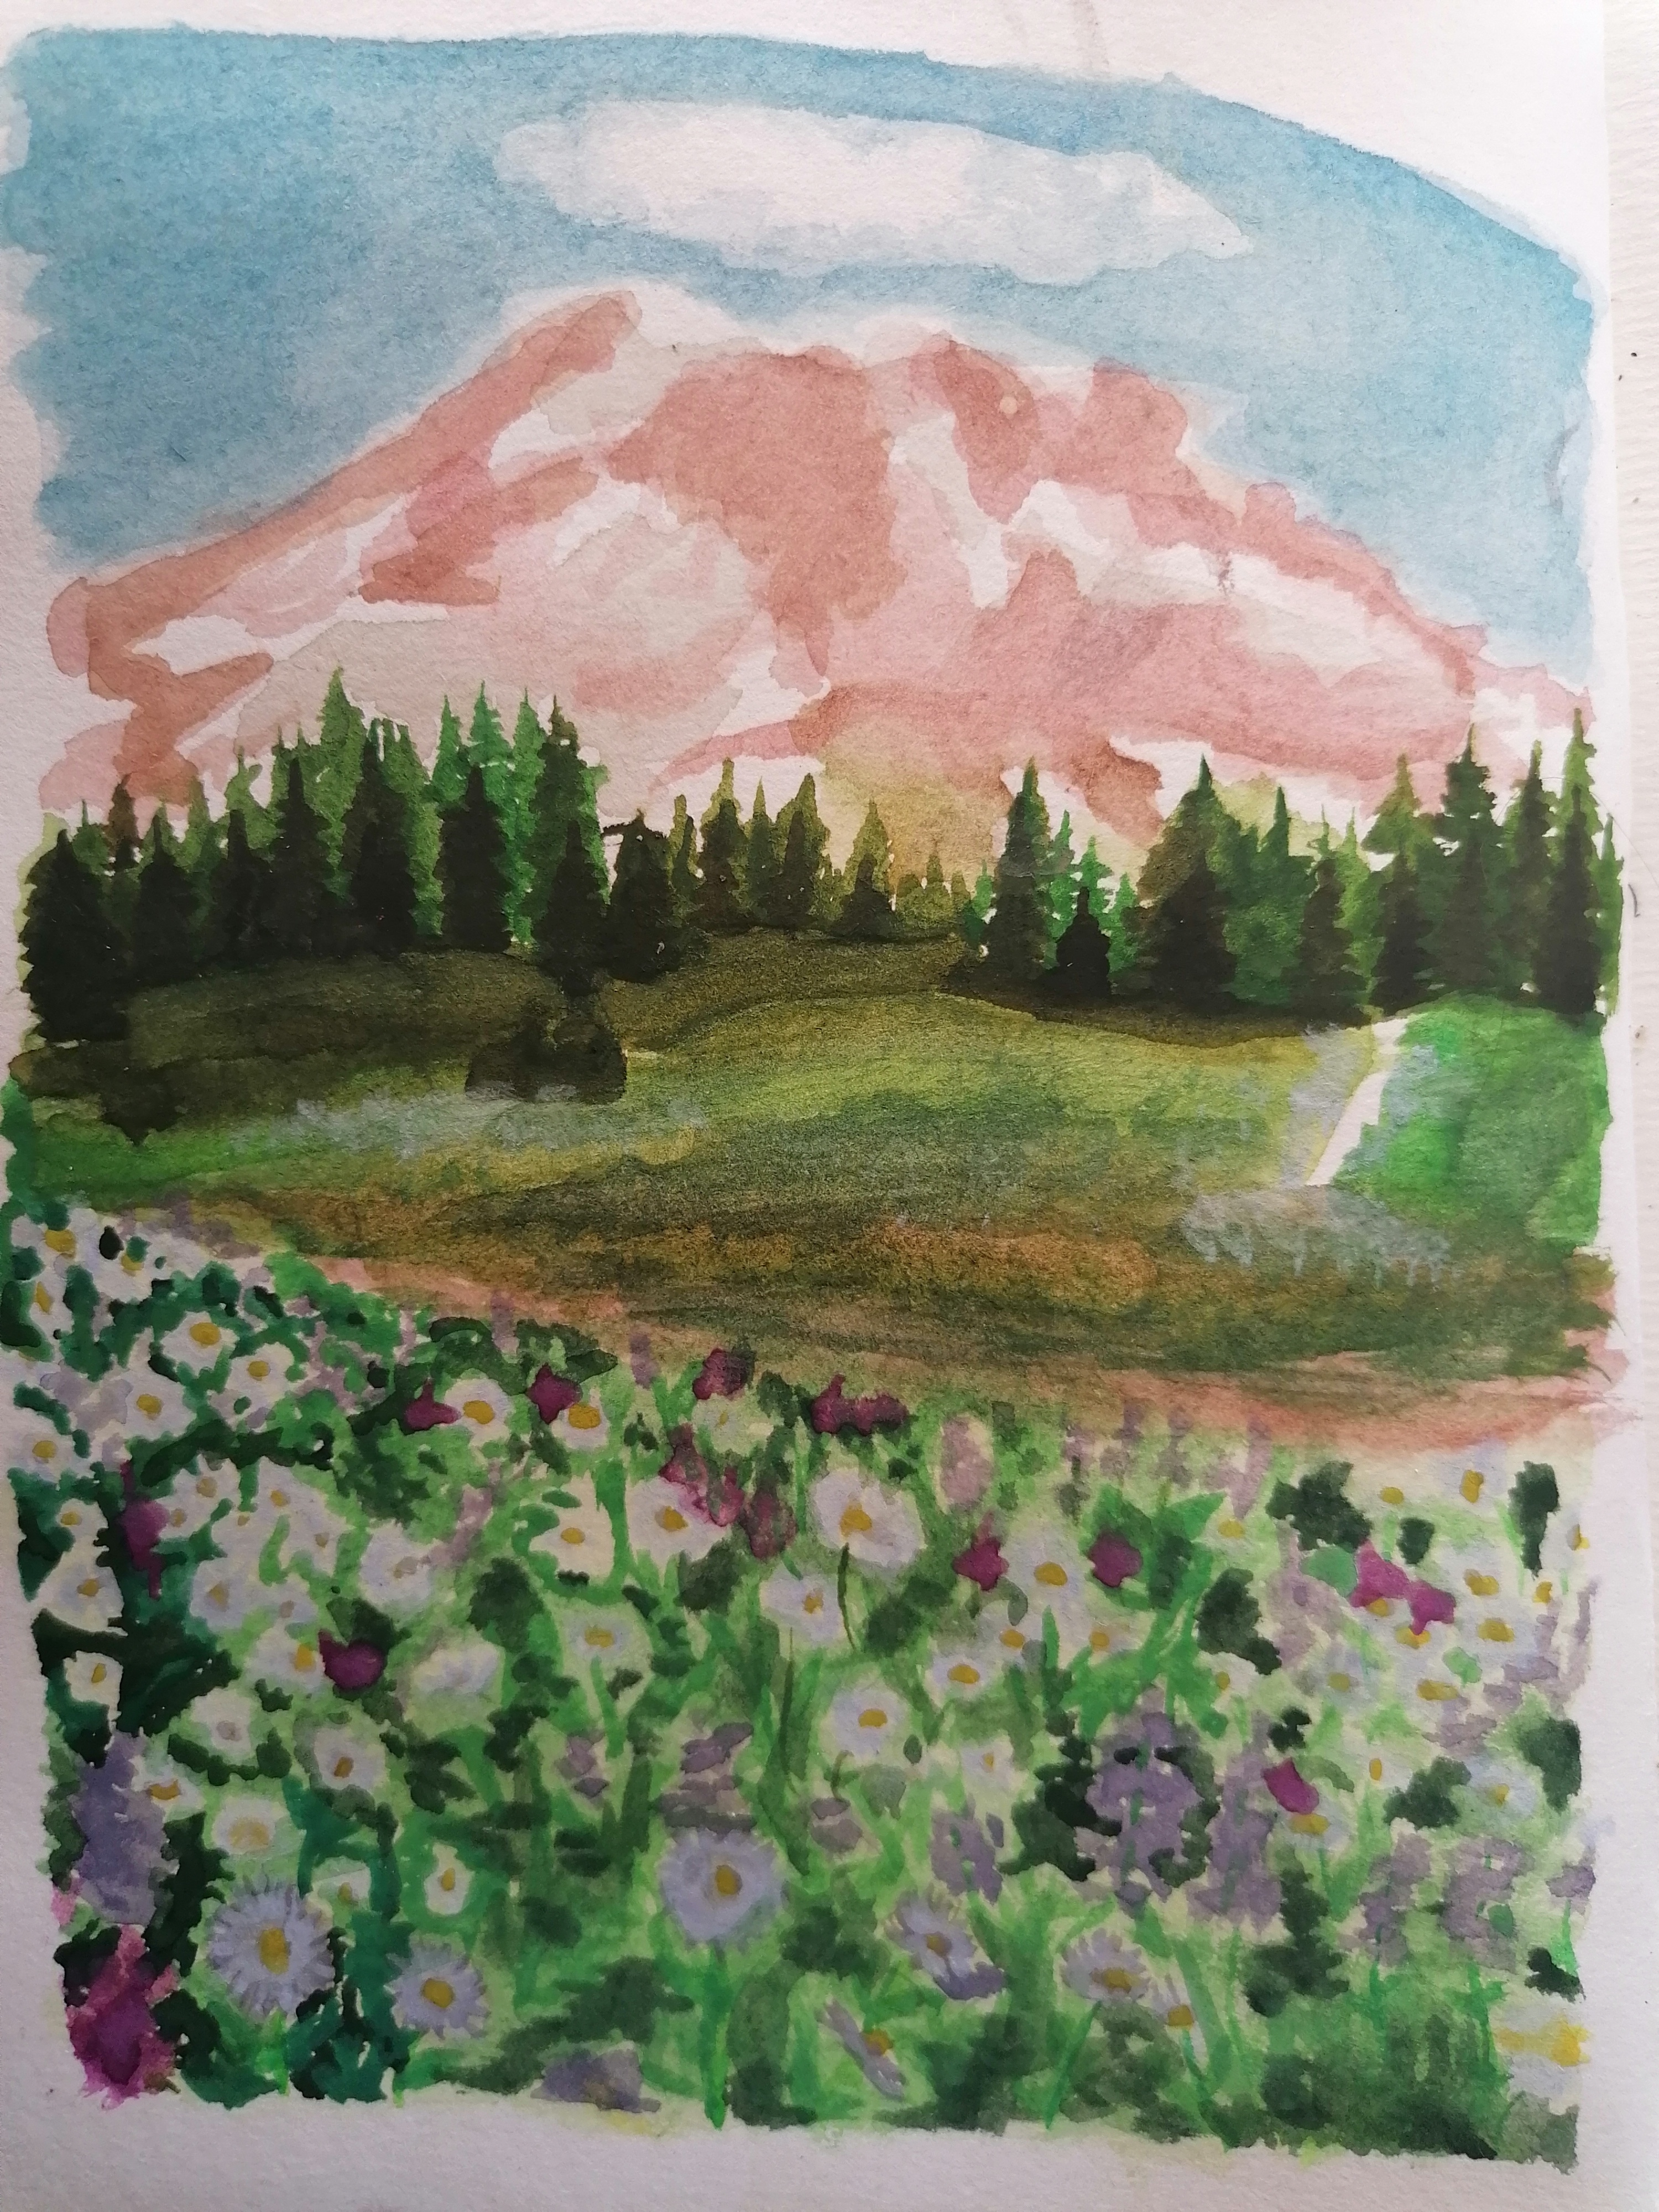 quick watercolor study